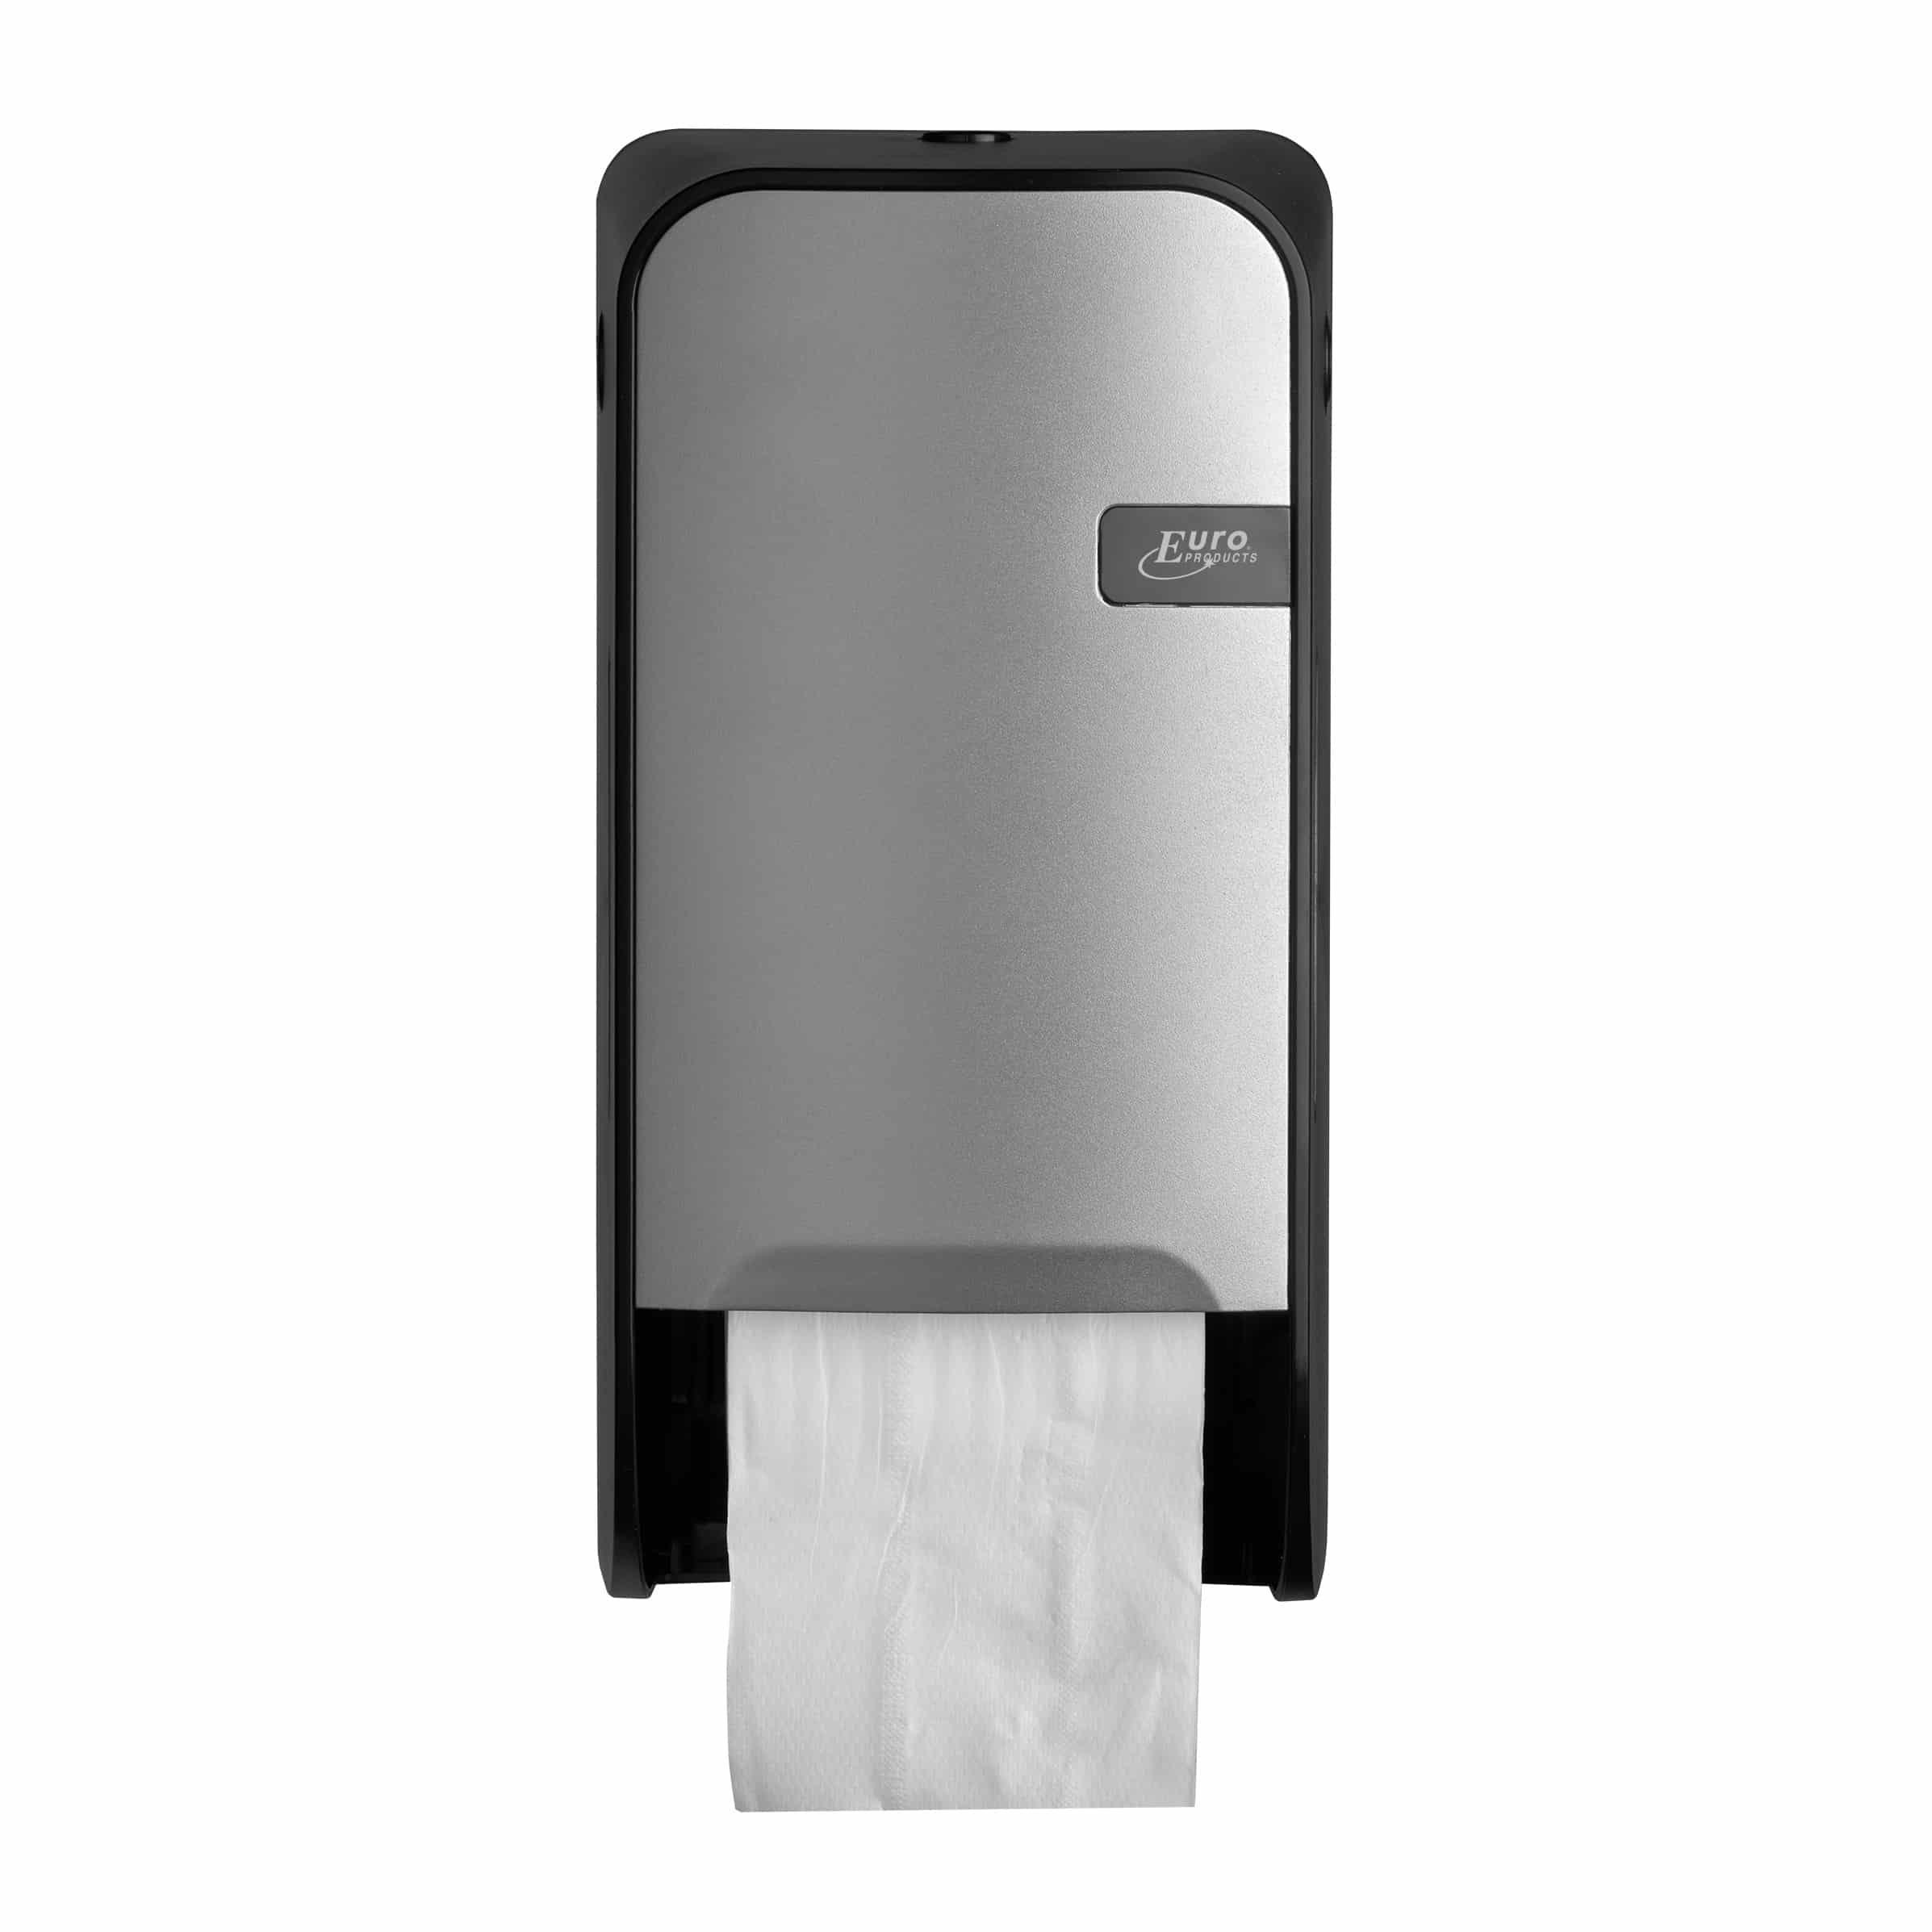 Quartz duo toiletrolhouder met remsysteem zilver - doprol